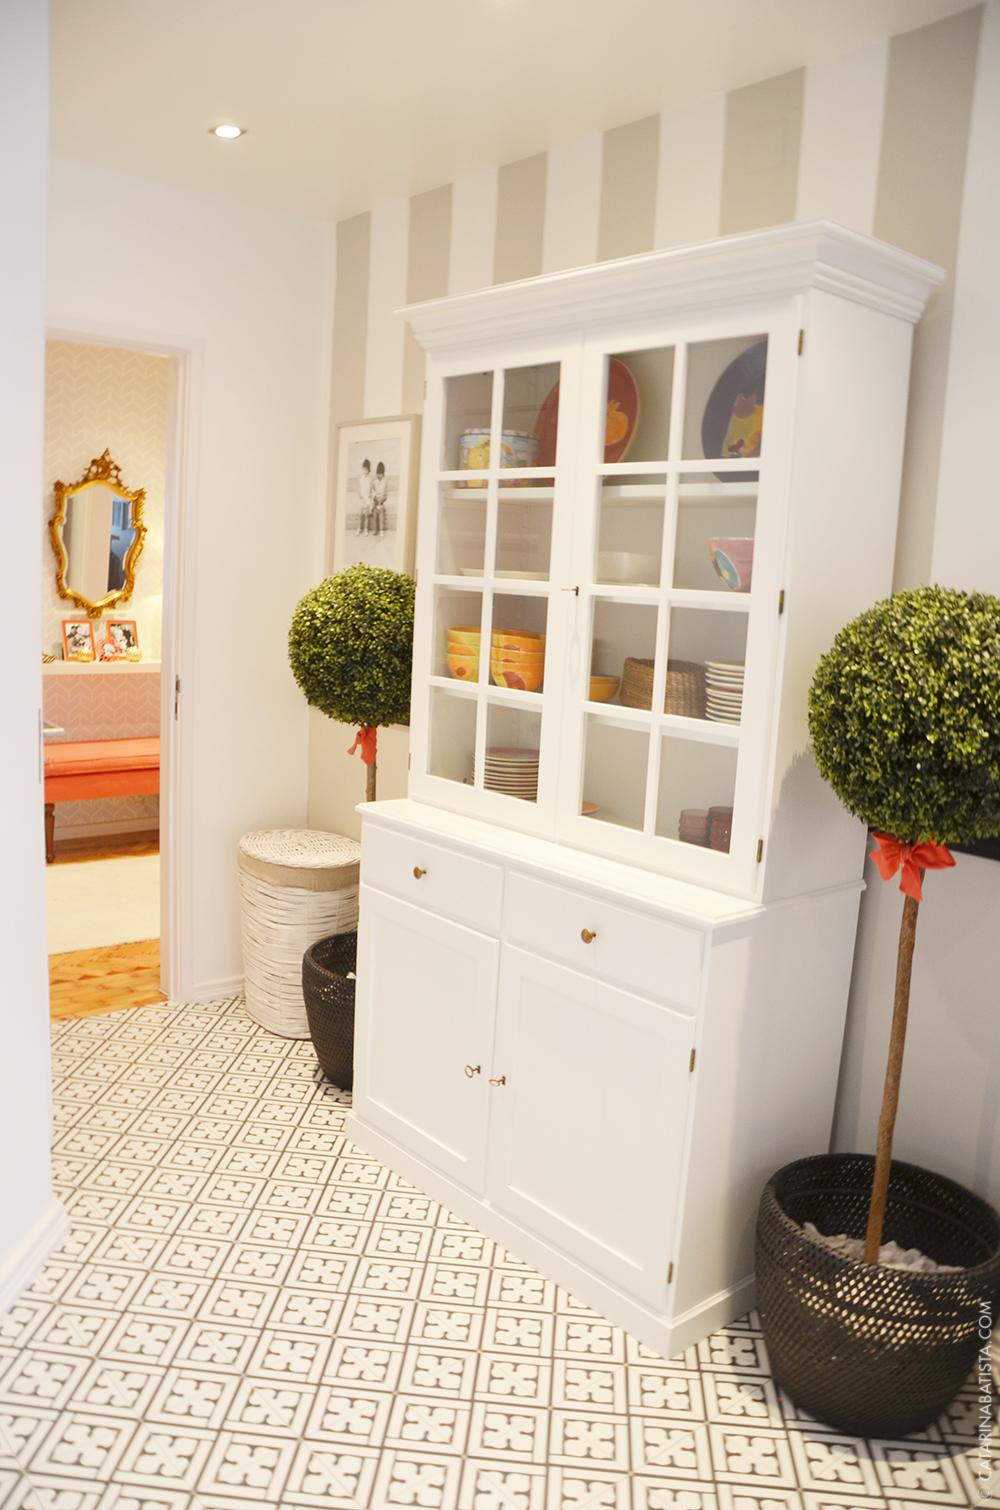 25-catarina-batista-arquitectura-design-interior-decoracao--apartamento-quarto-bedroom-livingroom-sala.jpg